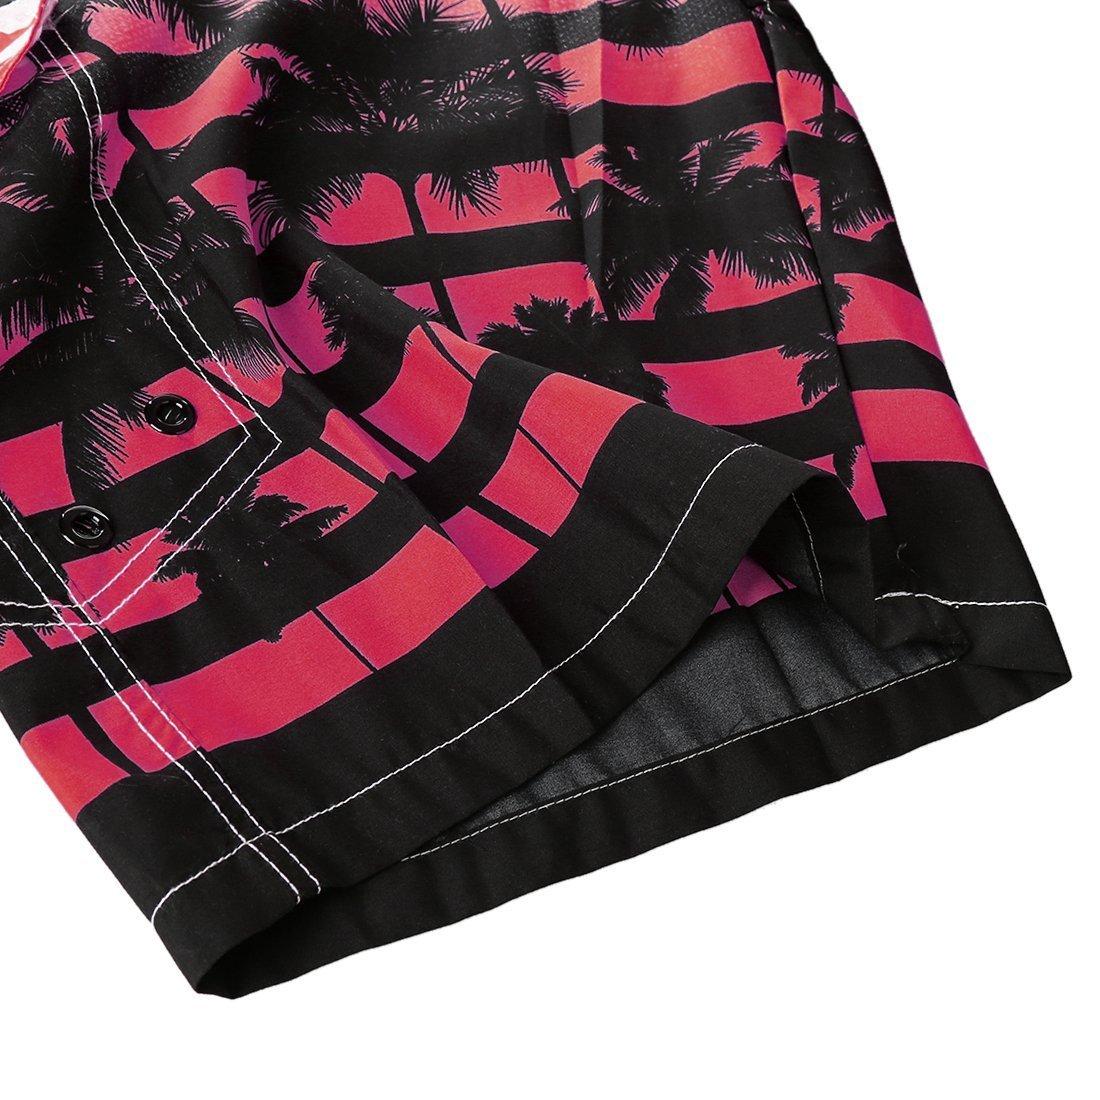 Mens Quick-Drying Beach Trunks Swimwear Coconut Tree Printing Pants Surfing Swimming Water Sports Board Shorts HDH Hawaiian Shorts